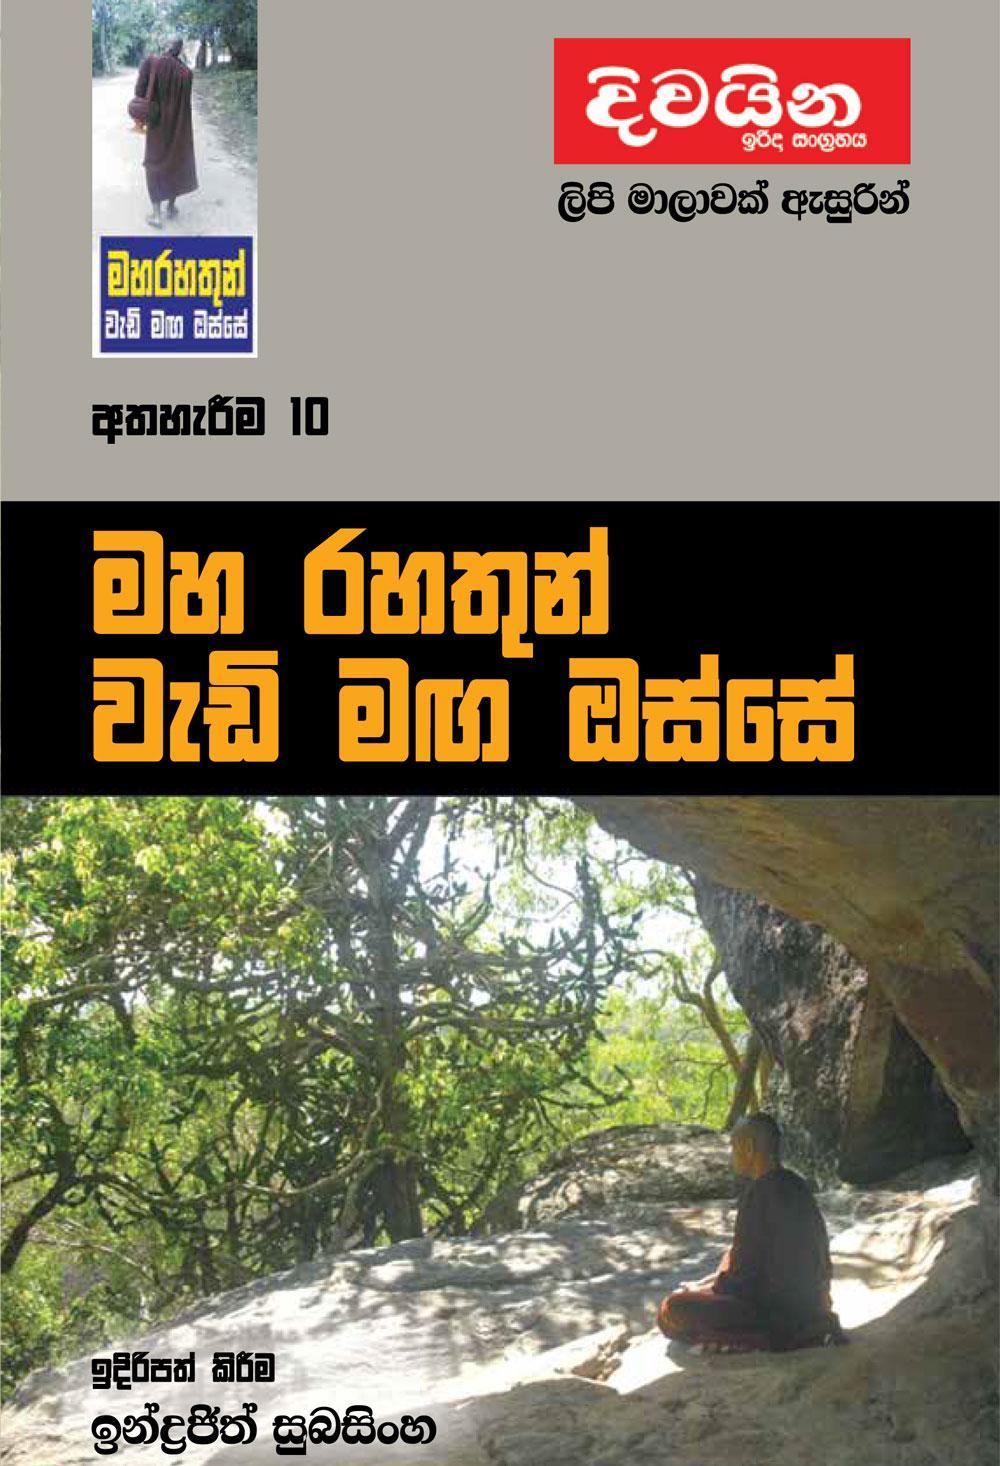 Maha Rahathun Wadi Maga Osse Book 10